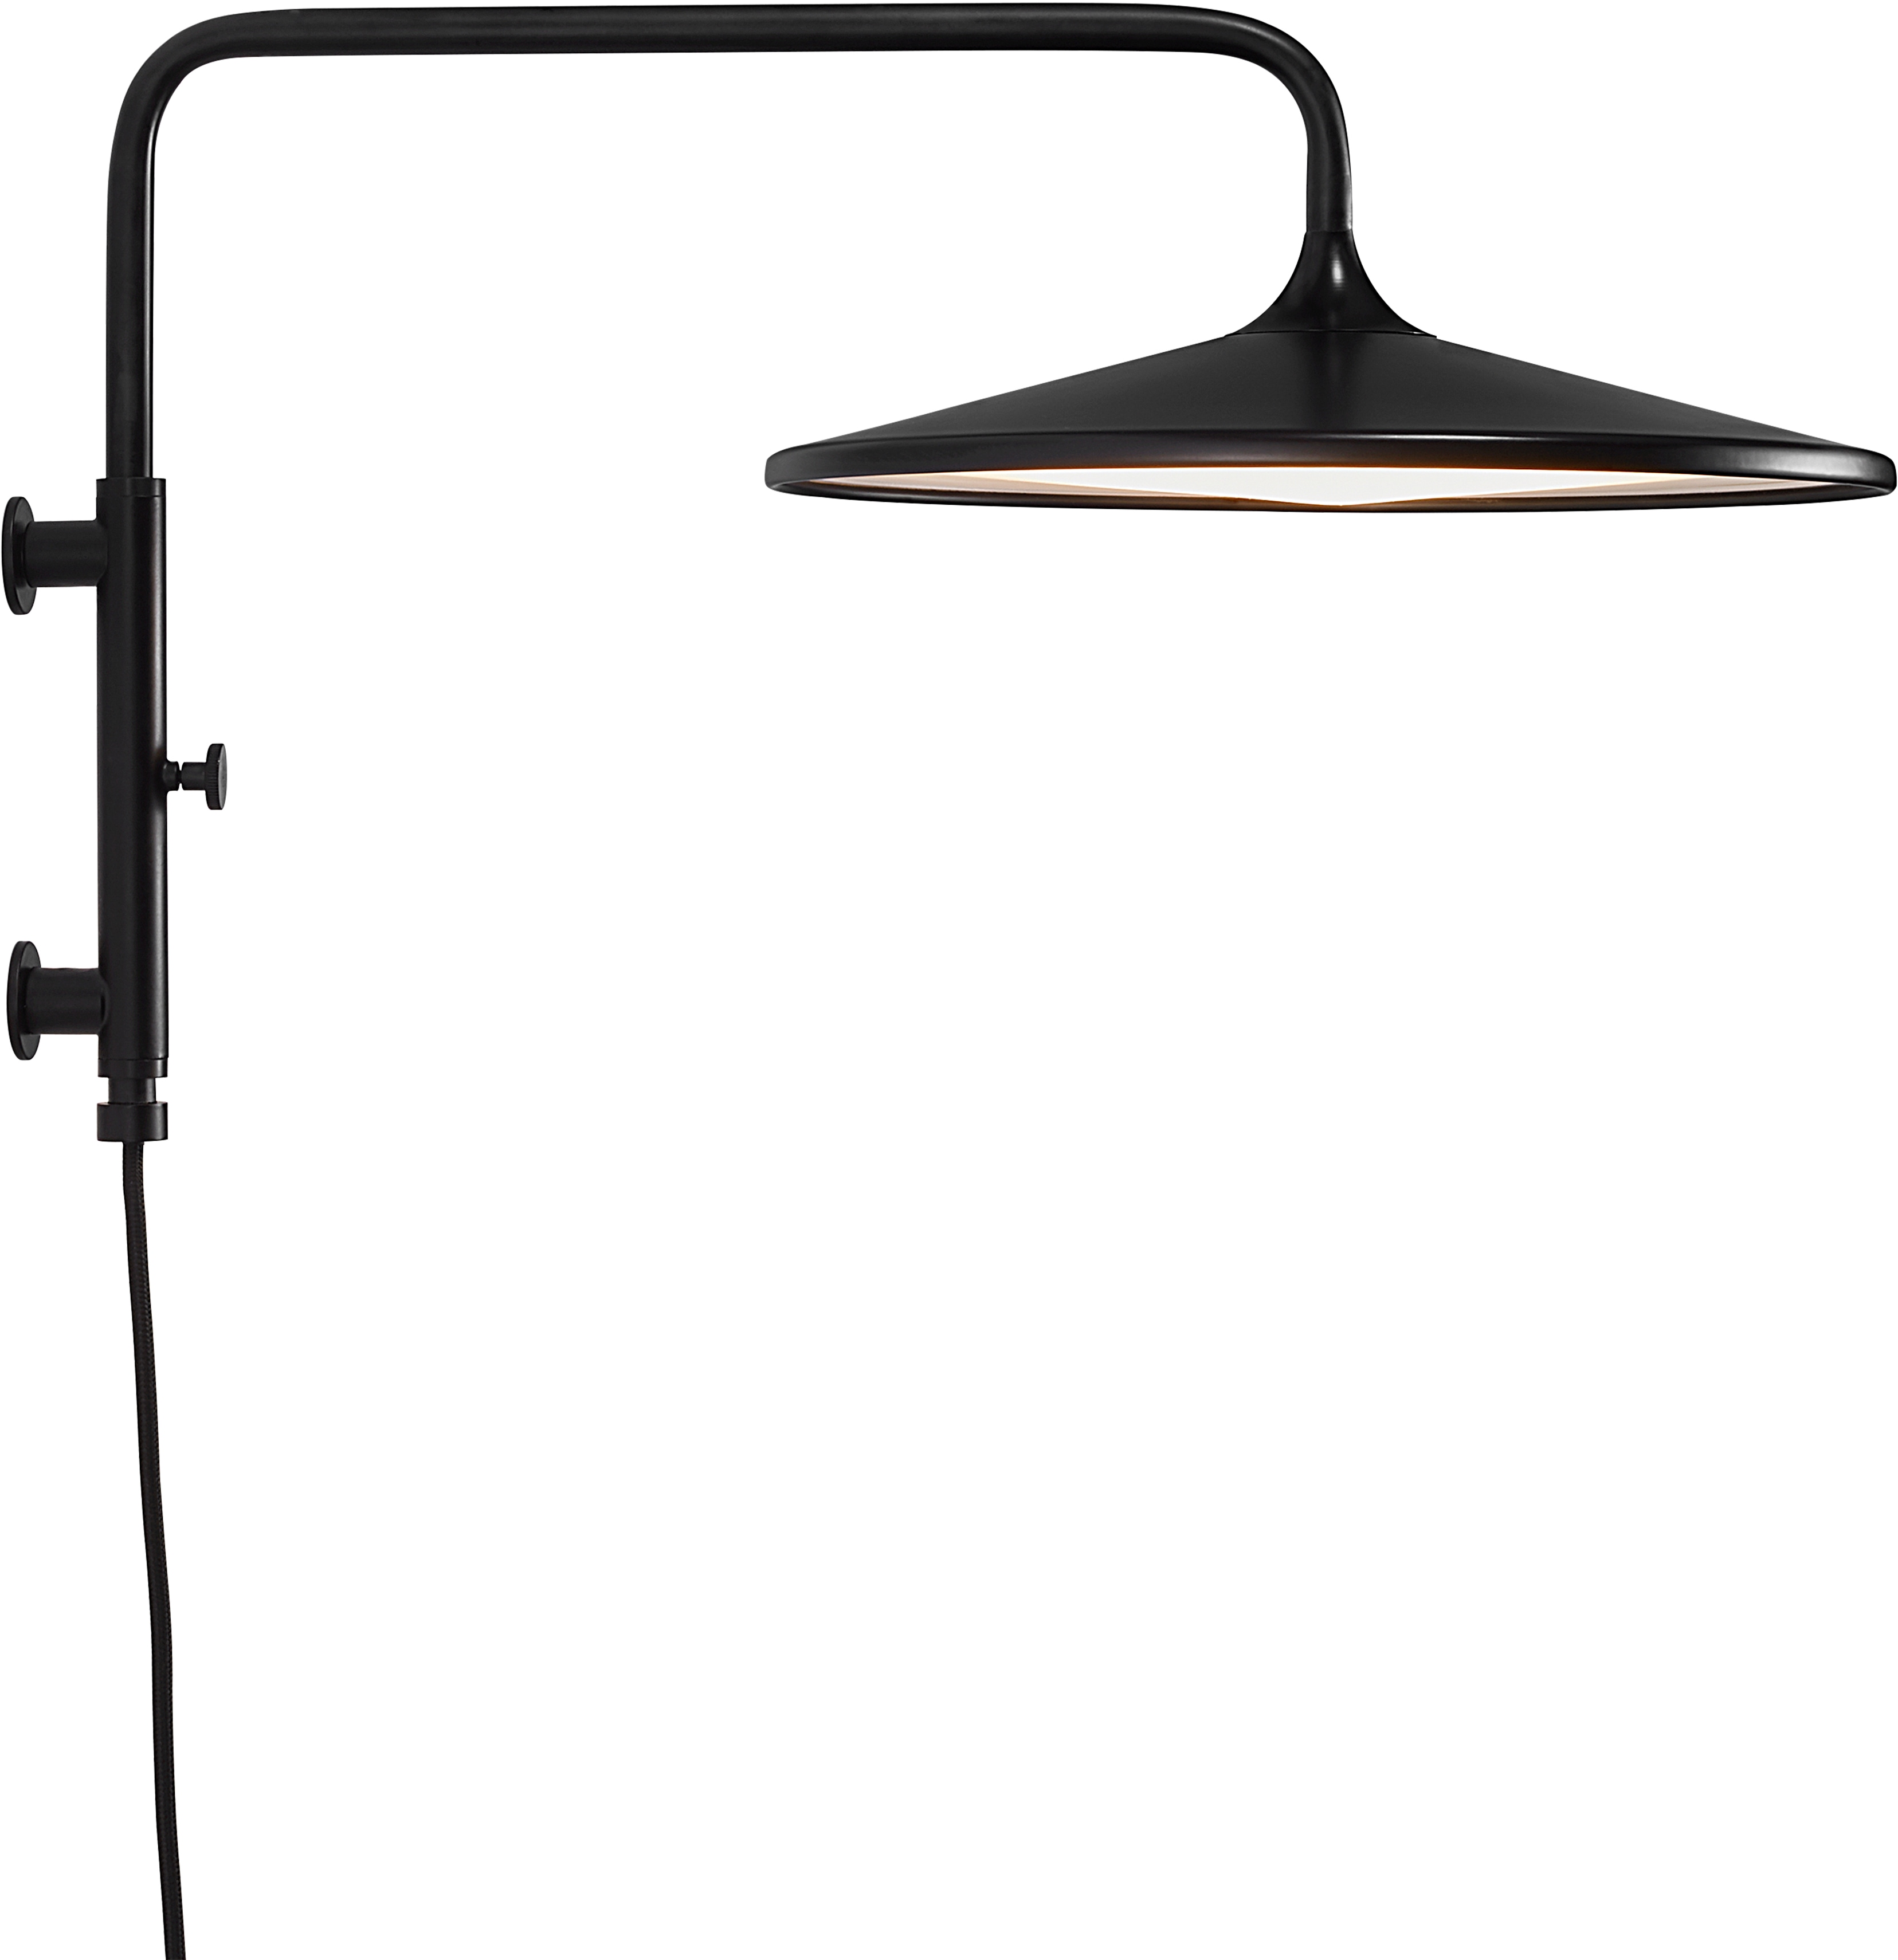 Nordlux LED Wandleuchte BALANCE, LED-Modul, Warmweiß, inkl. LED Modul + Dimmer